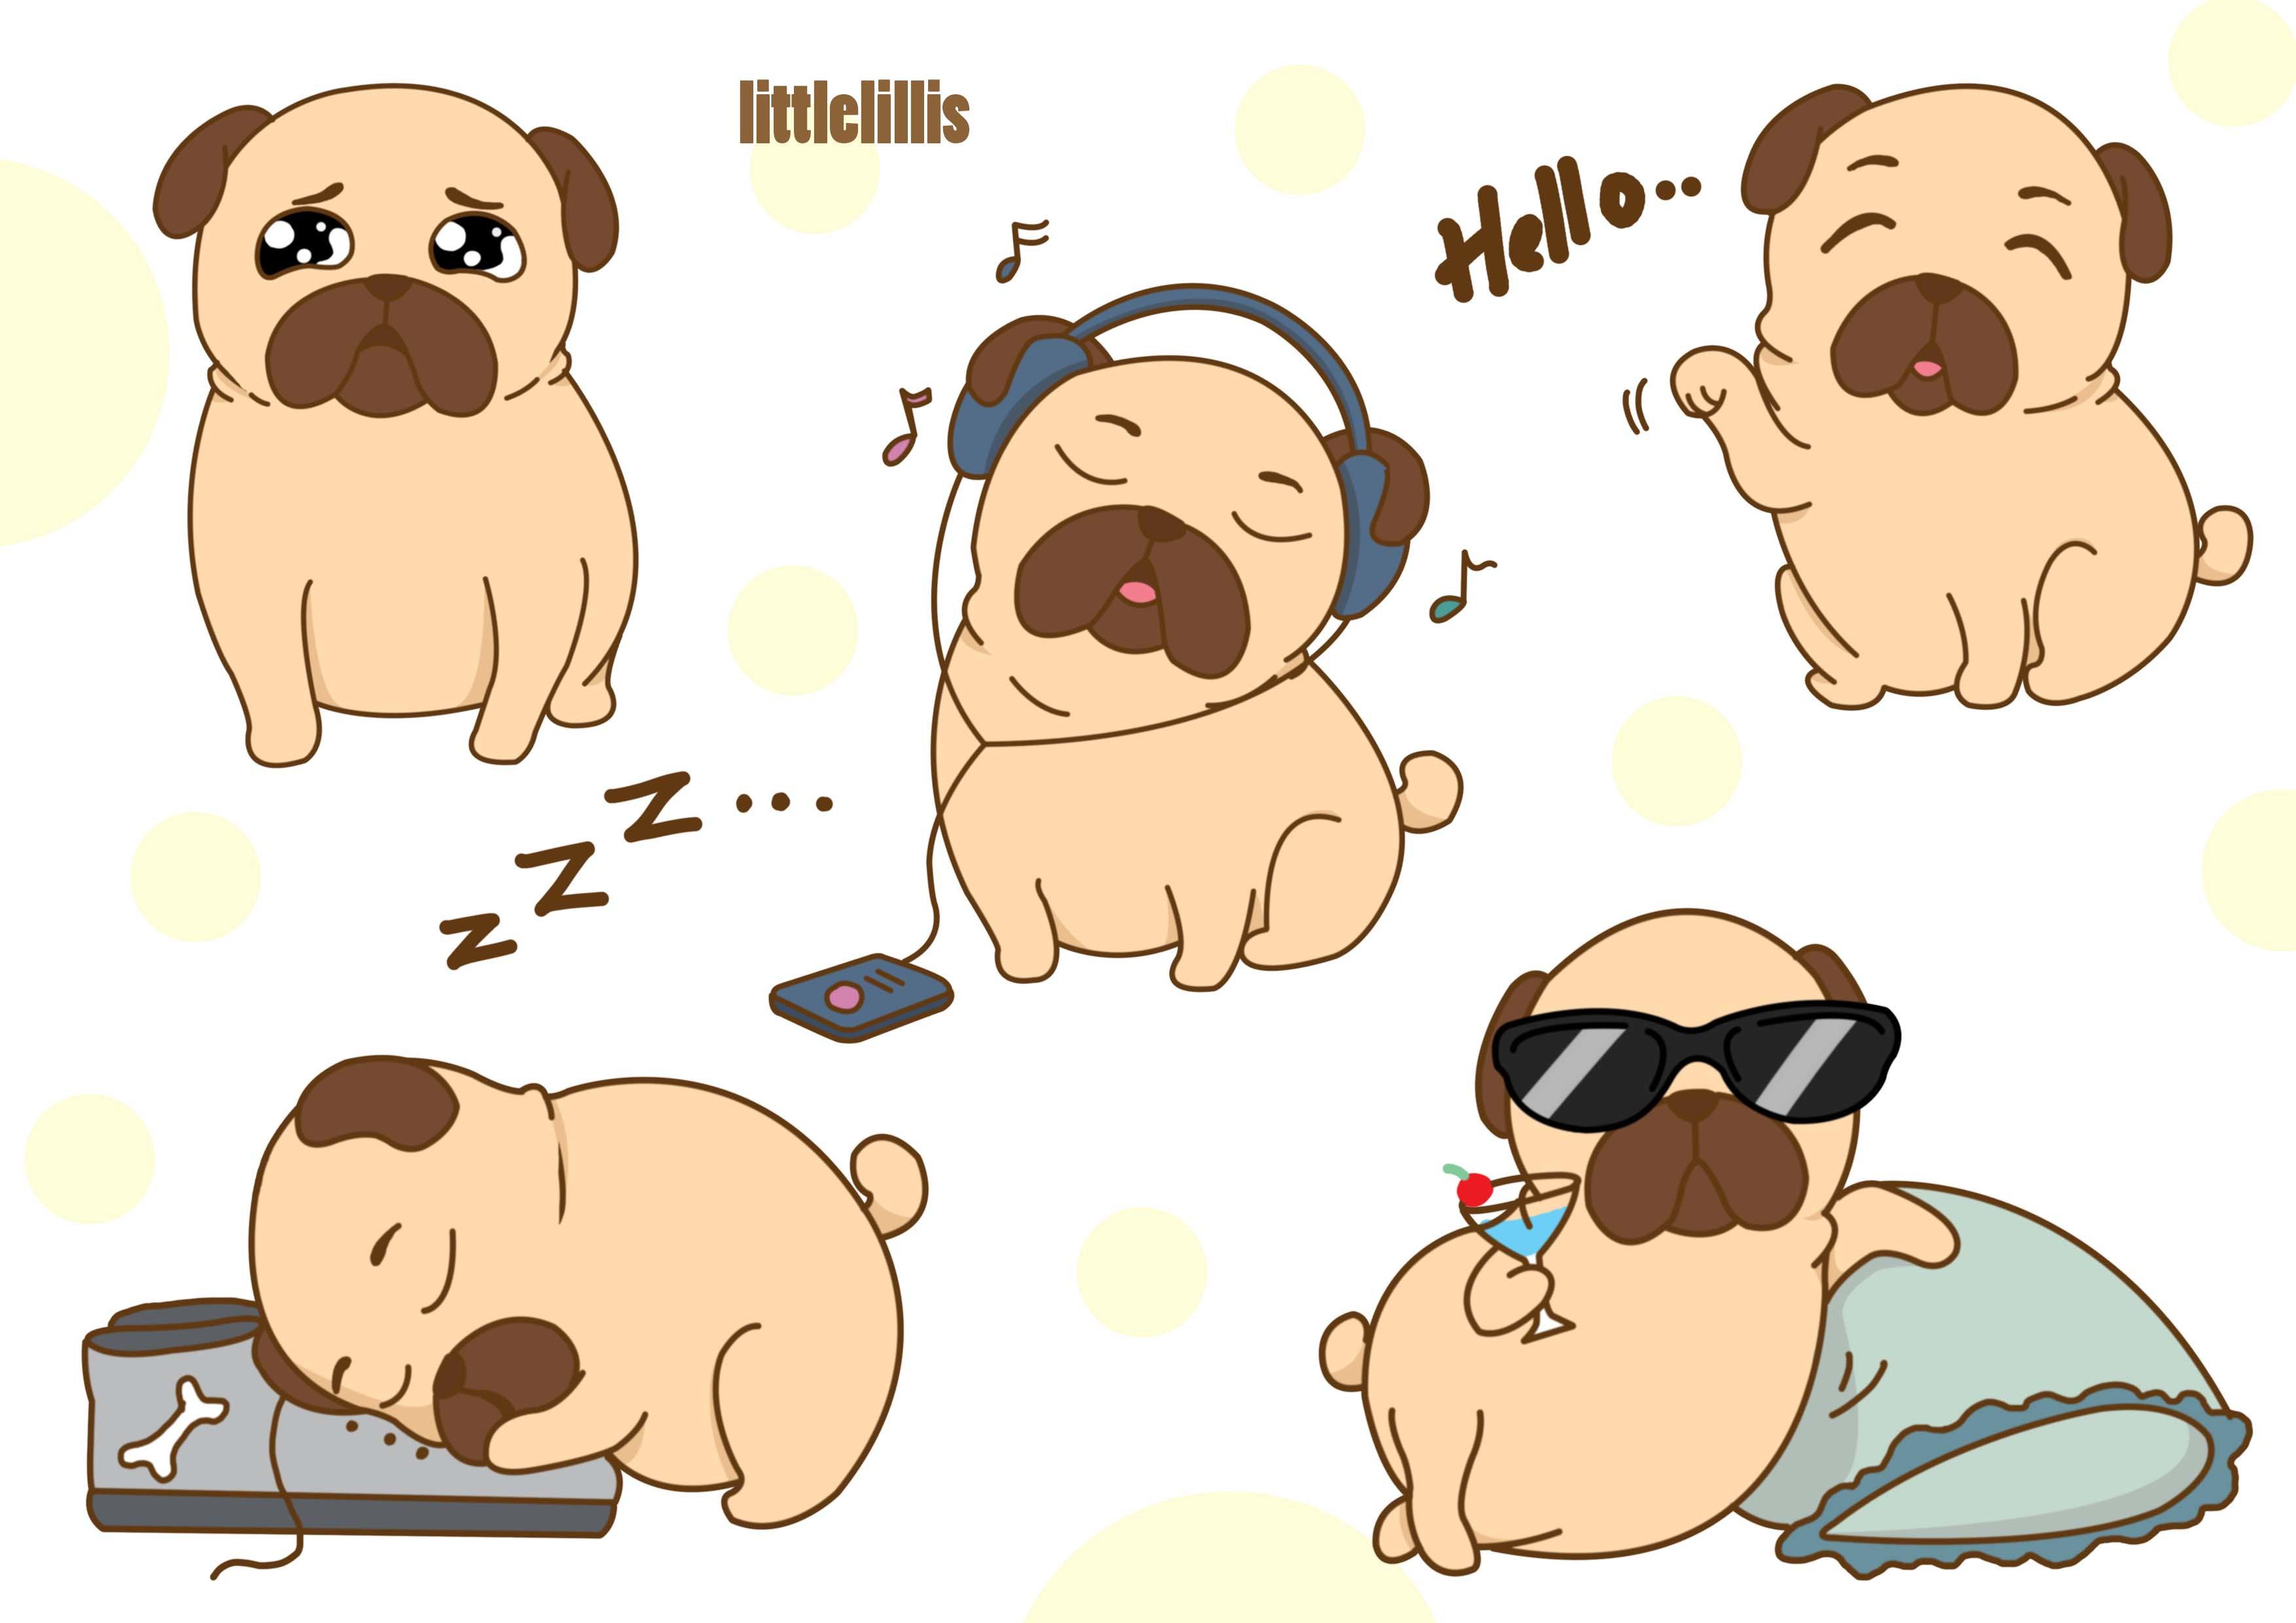 Draw Cute Dog Cartoon Illustration Pet Stickers Emojis By Littlelillis